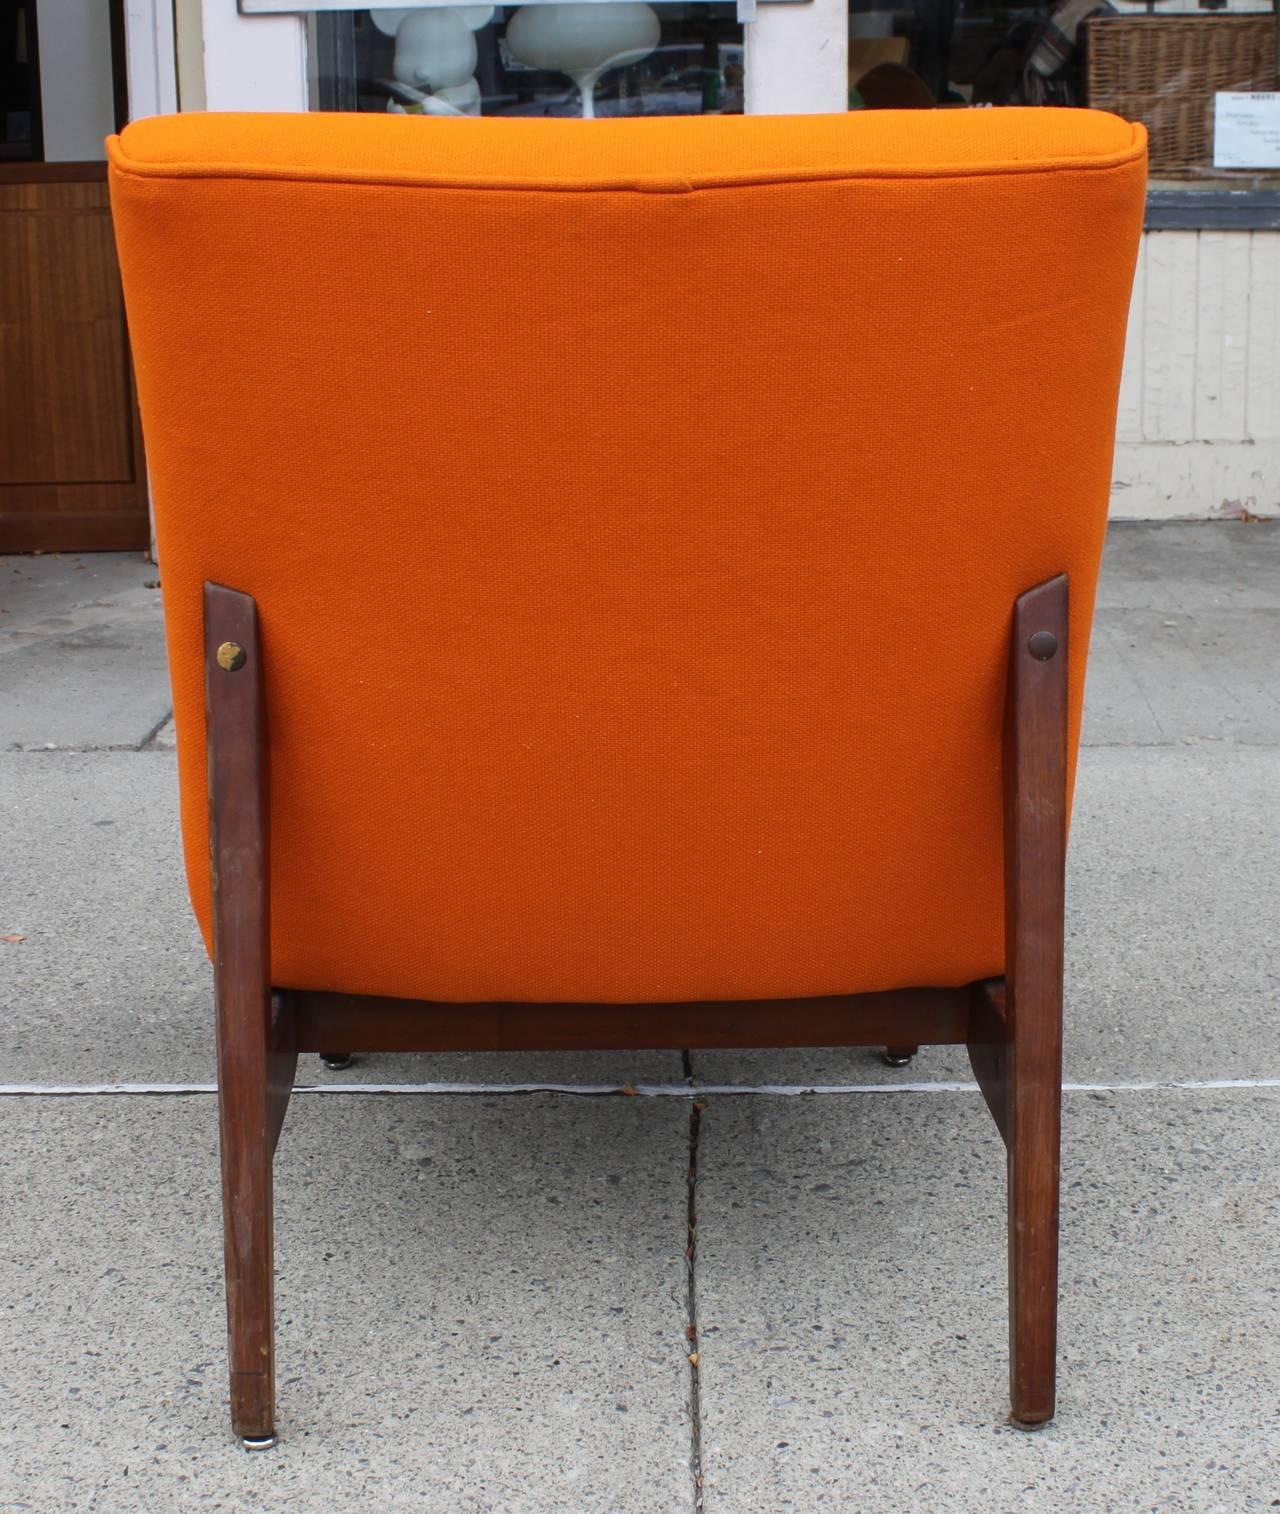 img chairs for sale redman power chair reviews pair of vintage gunlocke lounge at 1stdibs